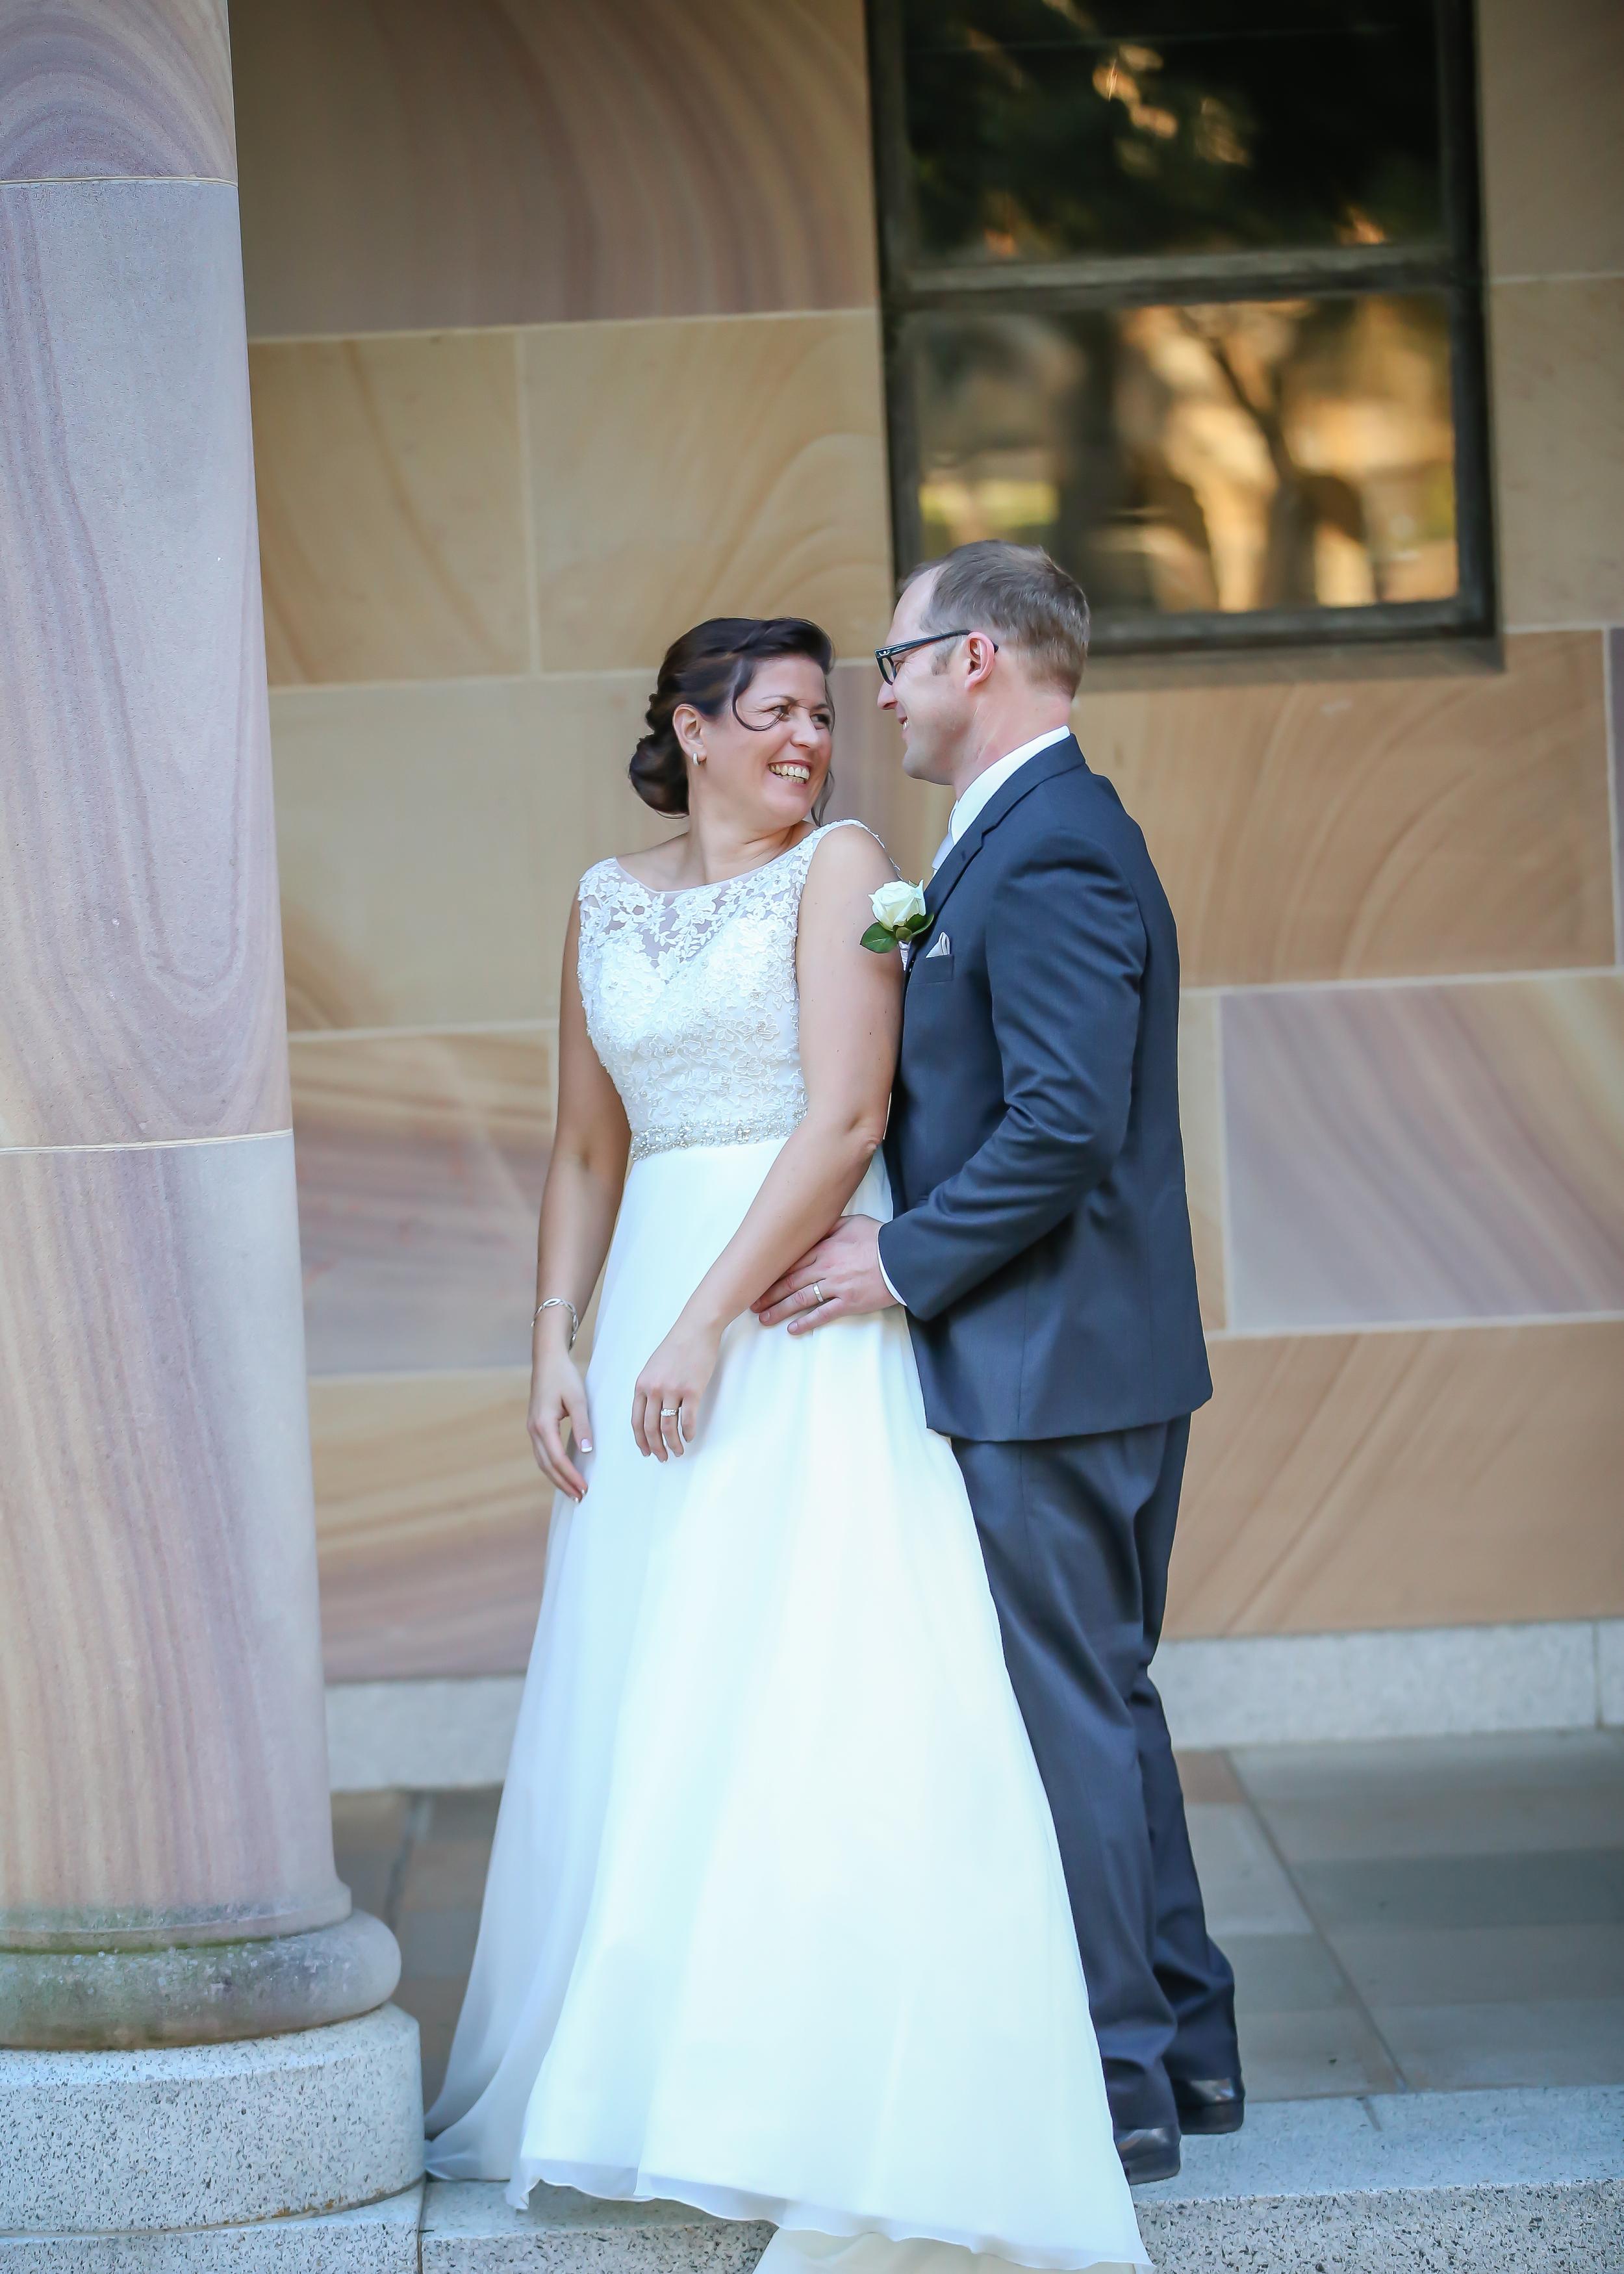 Brisbane wedding photographer - raw design photography